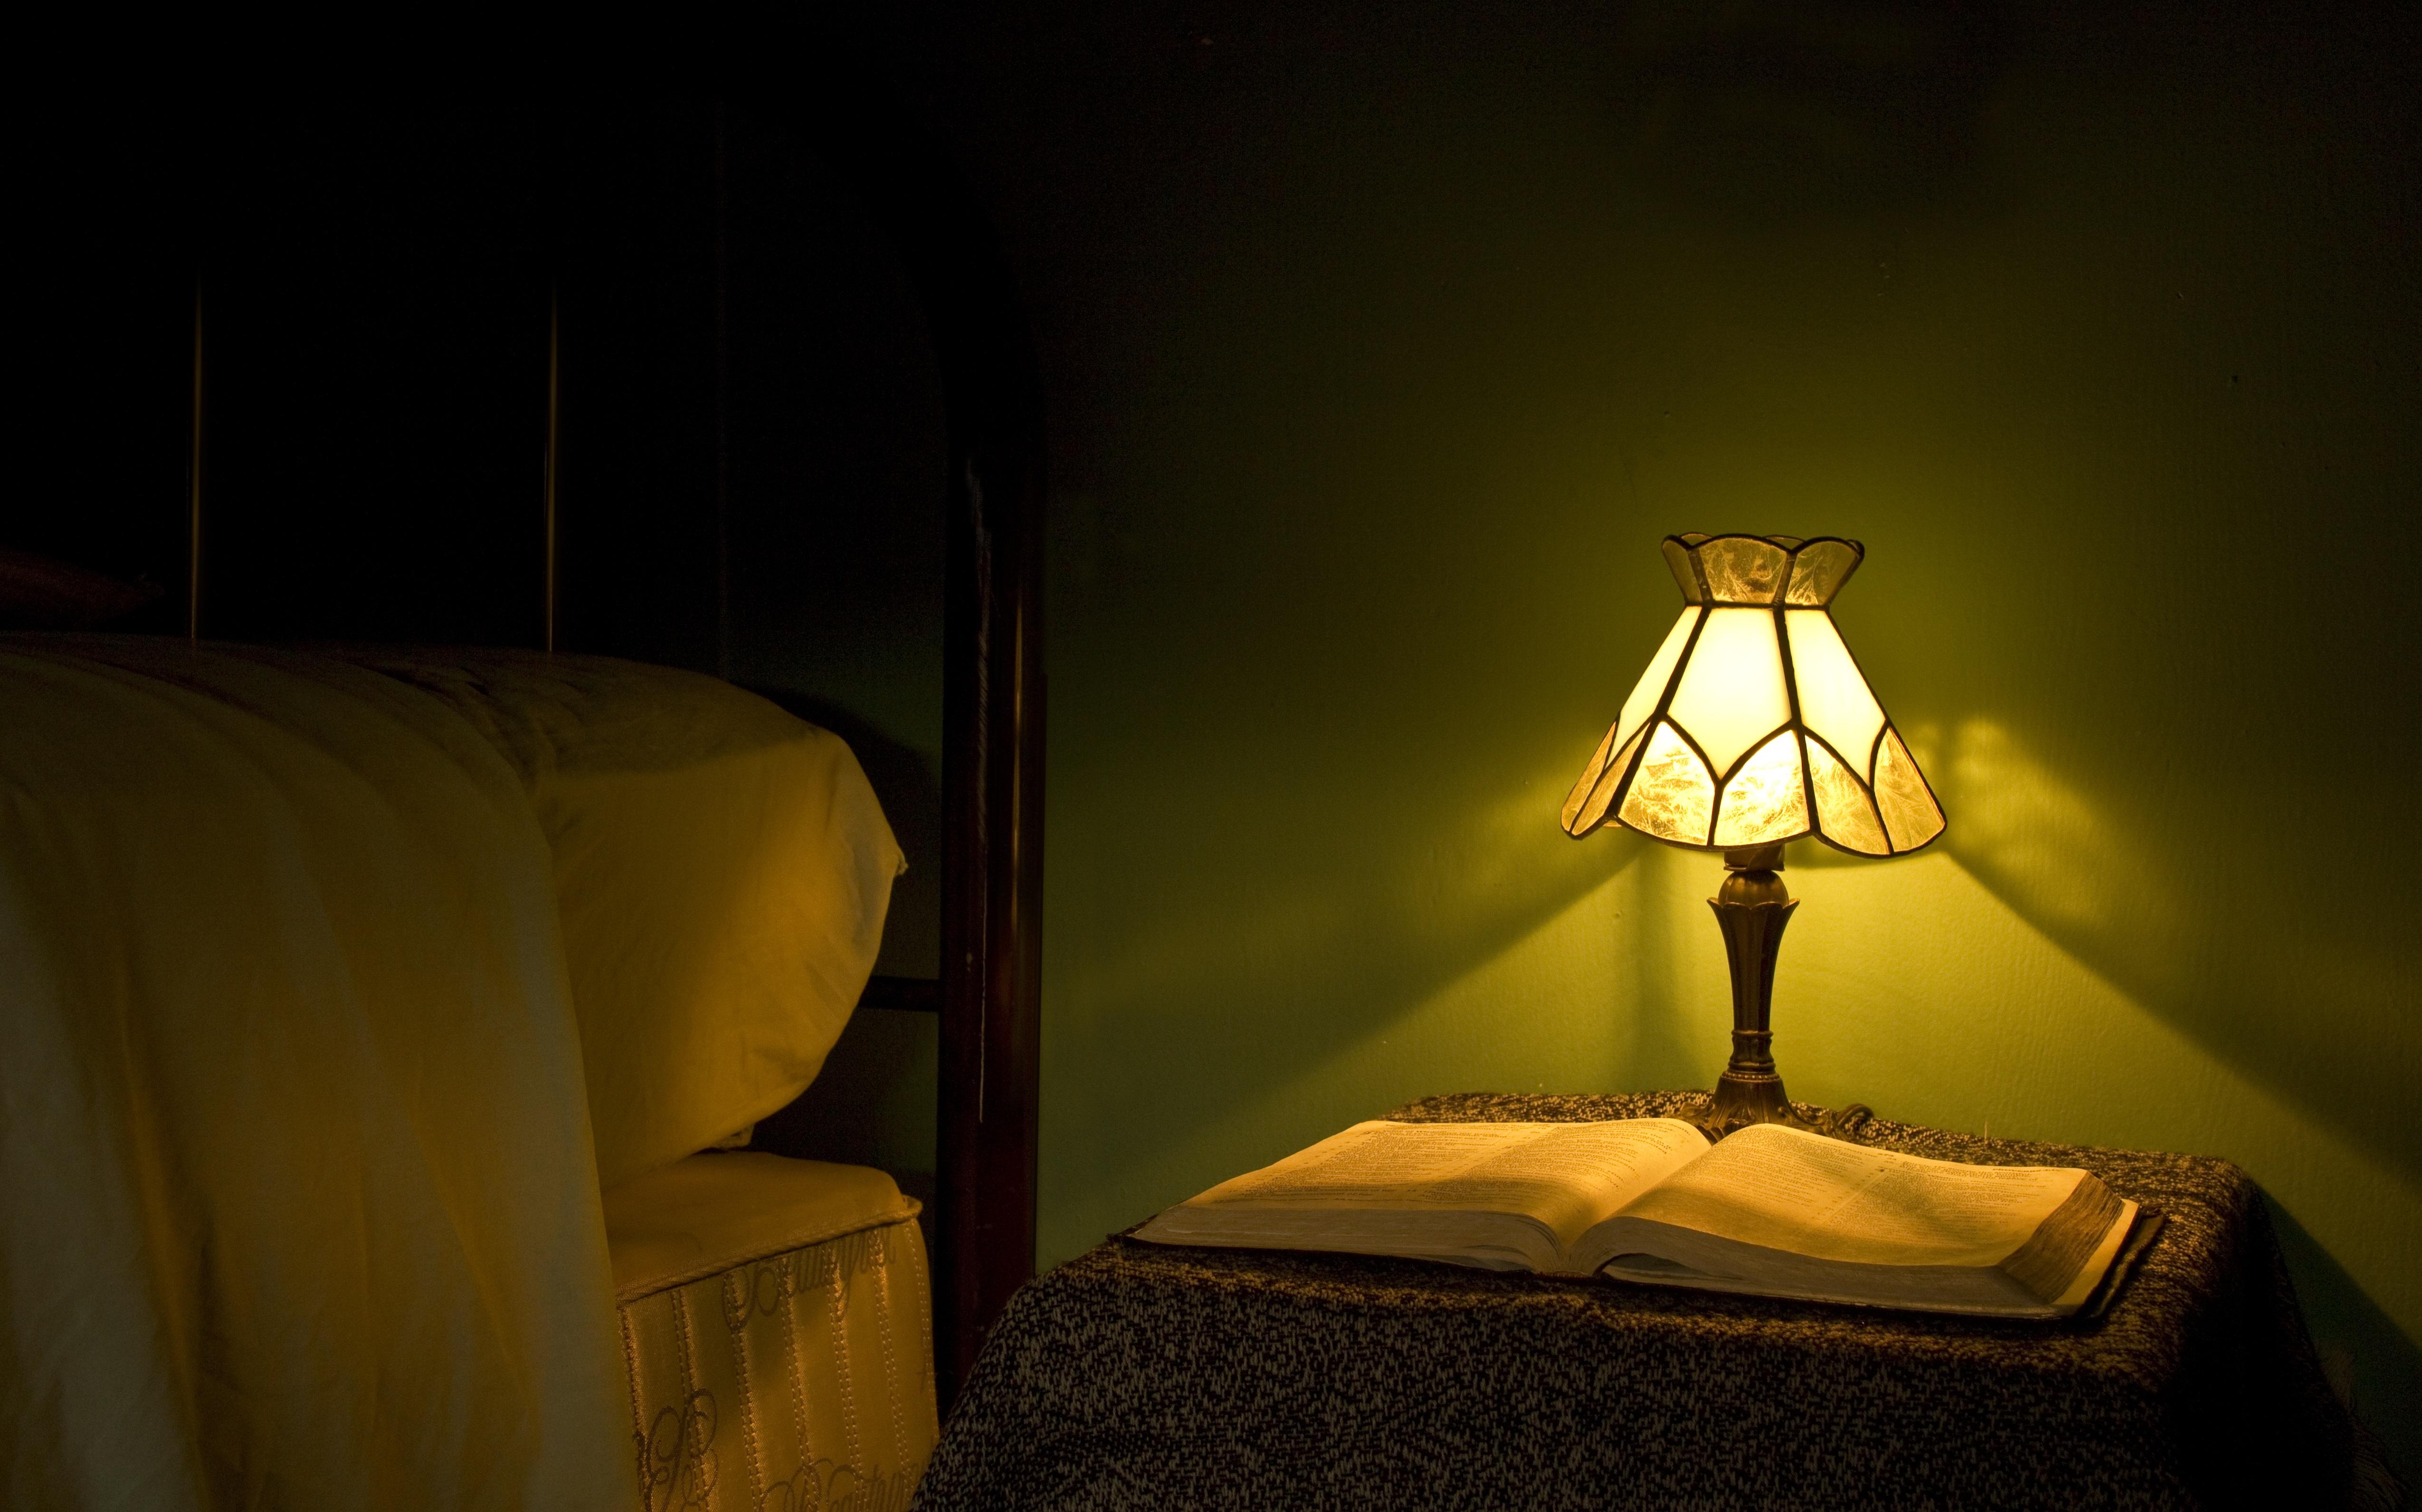 Free Images : night, sunlight, darkness, lamp, yellow, lighting ...